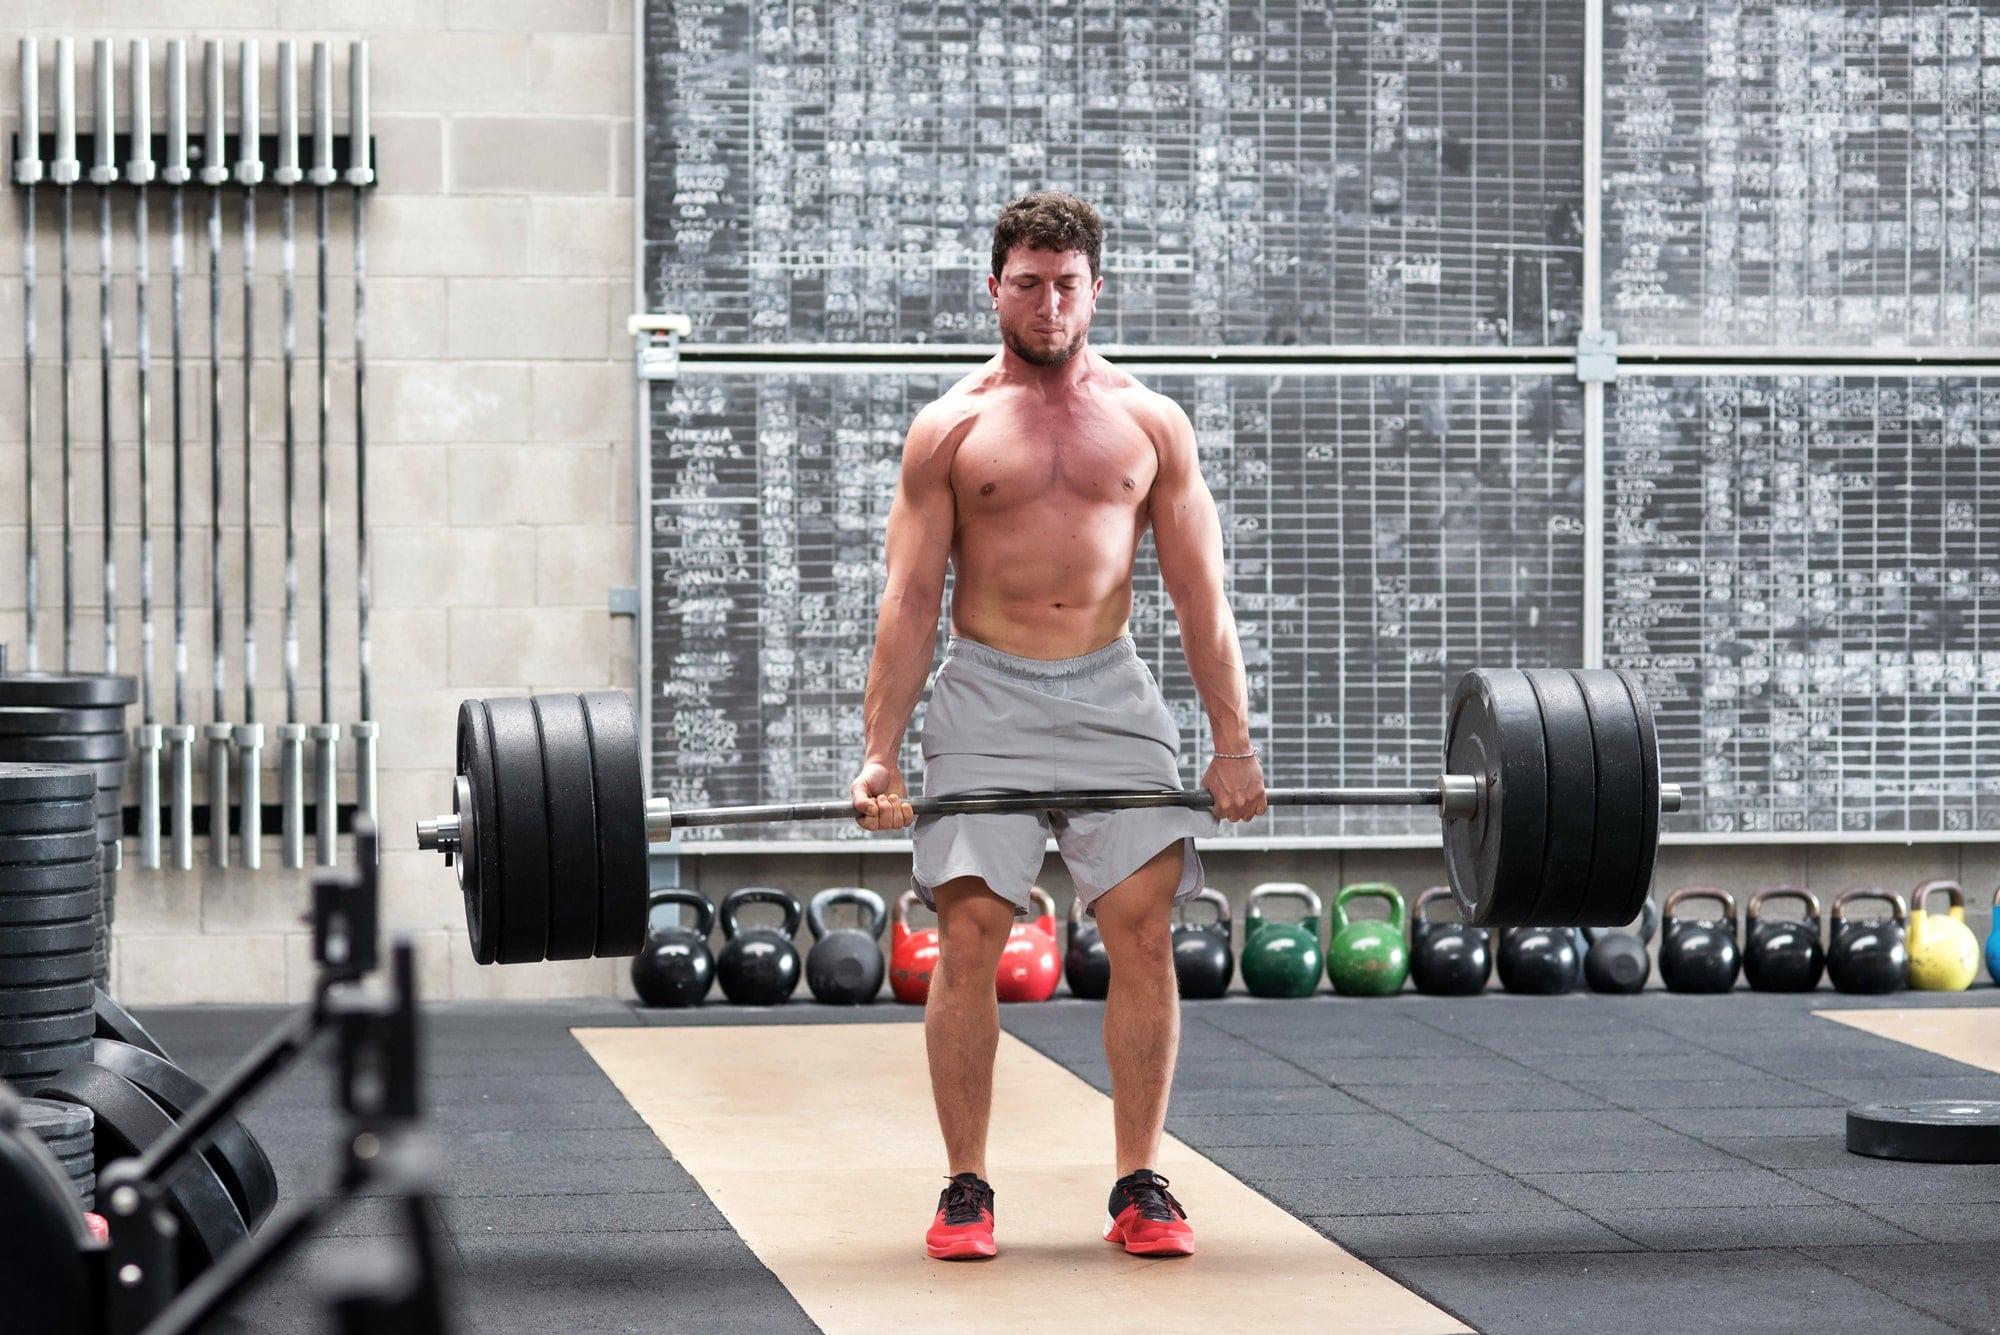 Crossfit athlete doing a deadlift